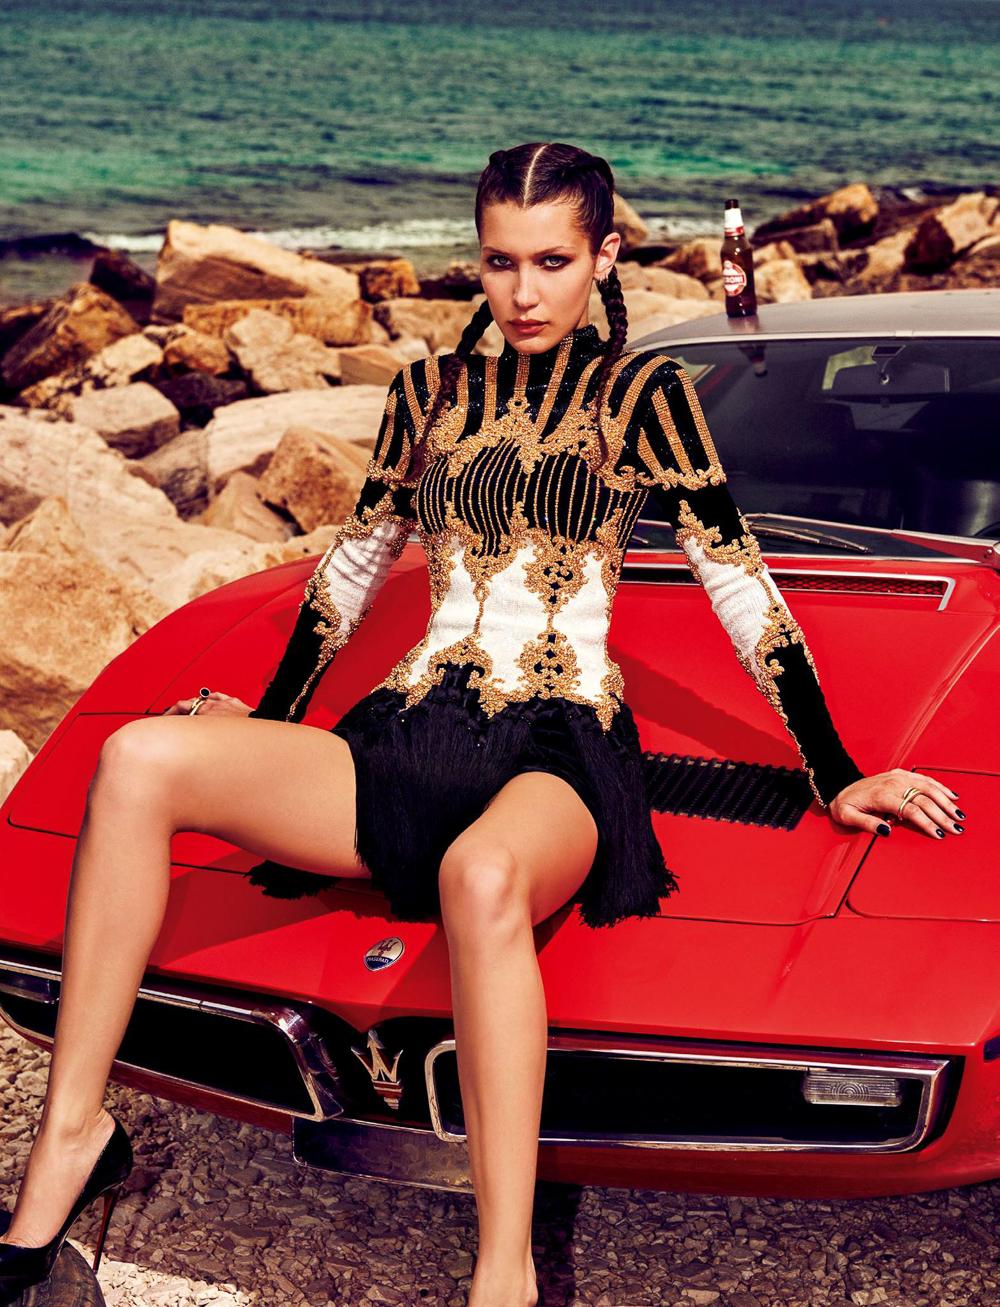 Vogue-Japan-November-2016-Bella-Hadid-Filip-Hrivnak-and-Julian-Schneyder-by-Giampaolo-Sgura- (3).jpg